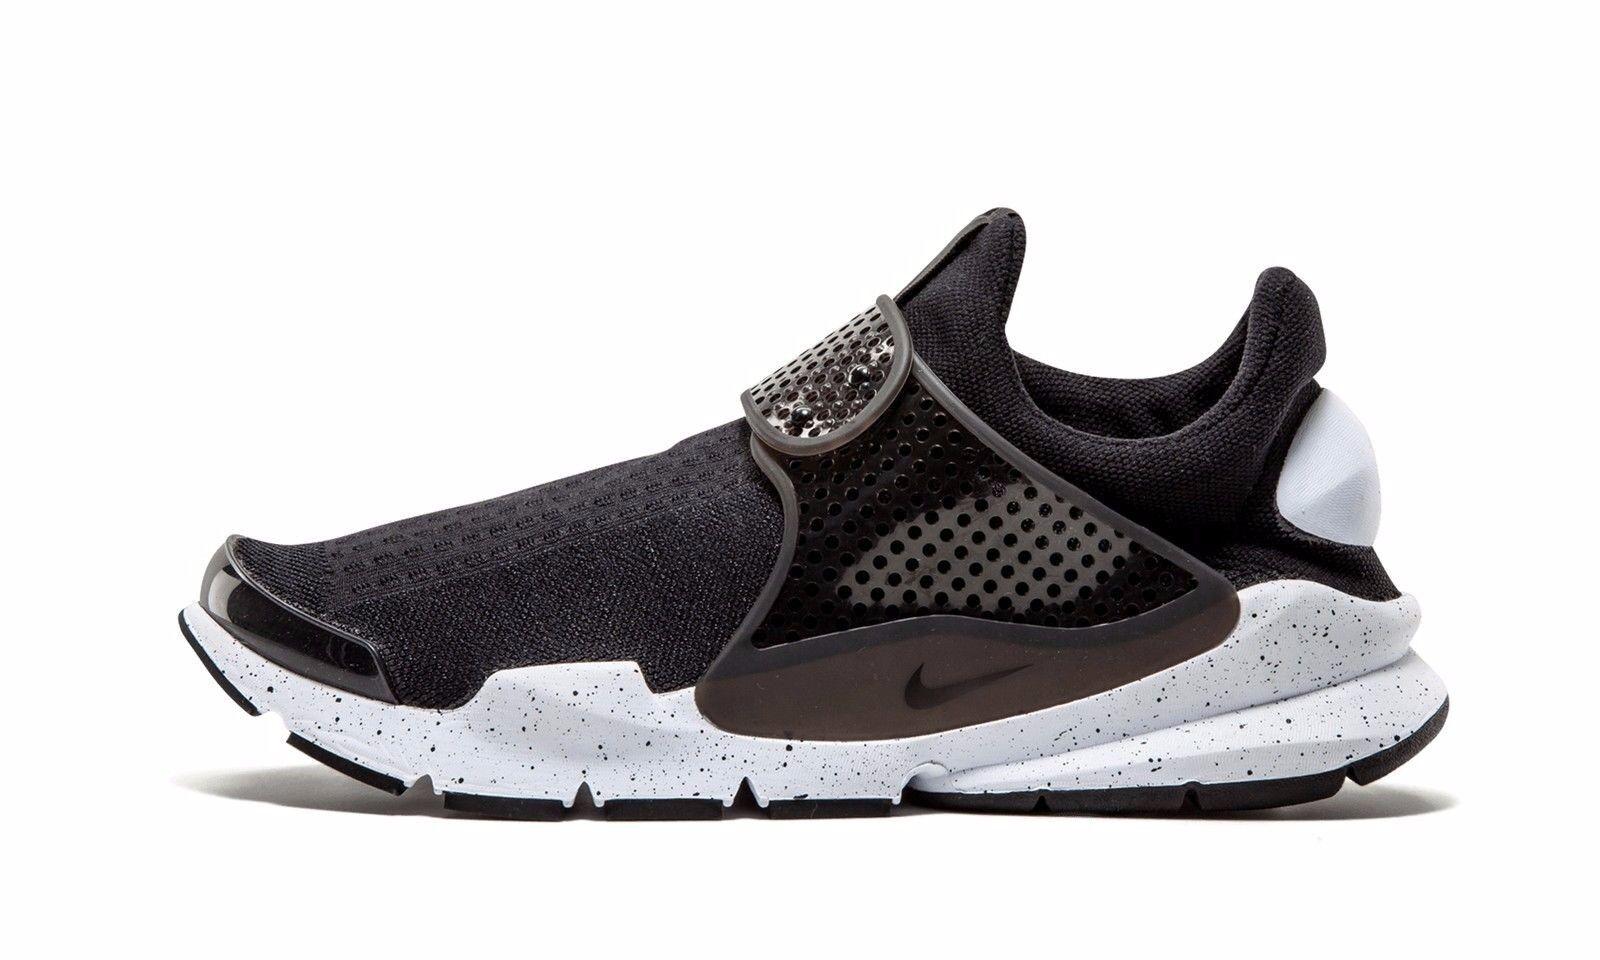 Nike sock dardo se 833124-001 nero bianco e 'scarpe da ginnastica us7